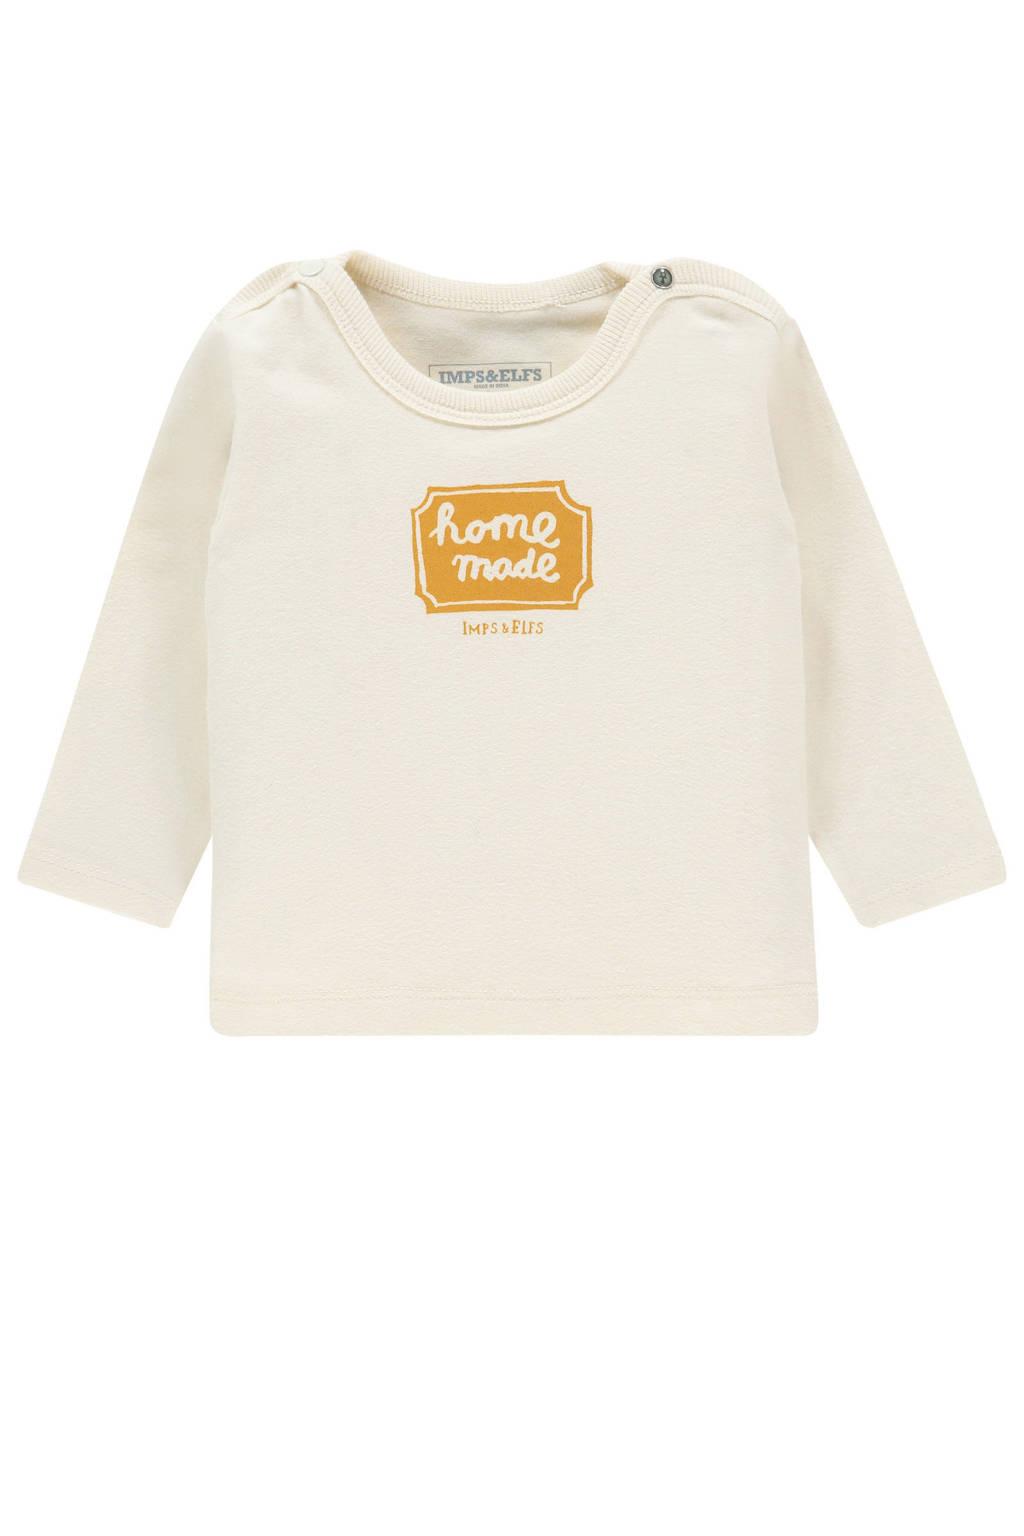 IMPS&ELFS baby longsleeve Ambleside met printopdruk ecru, Ecru